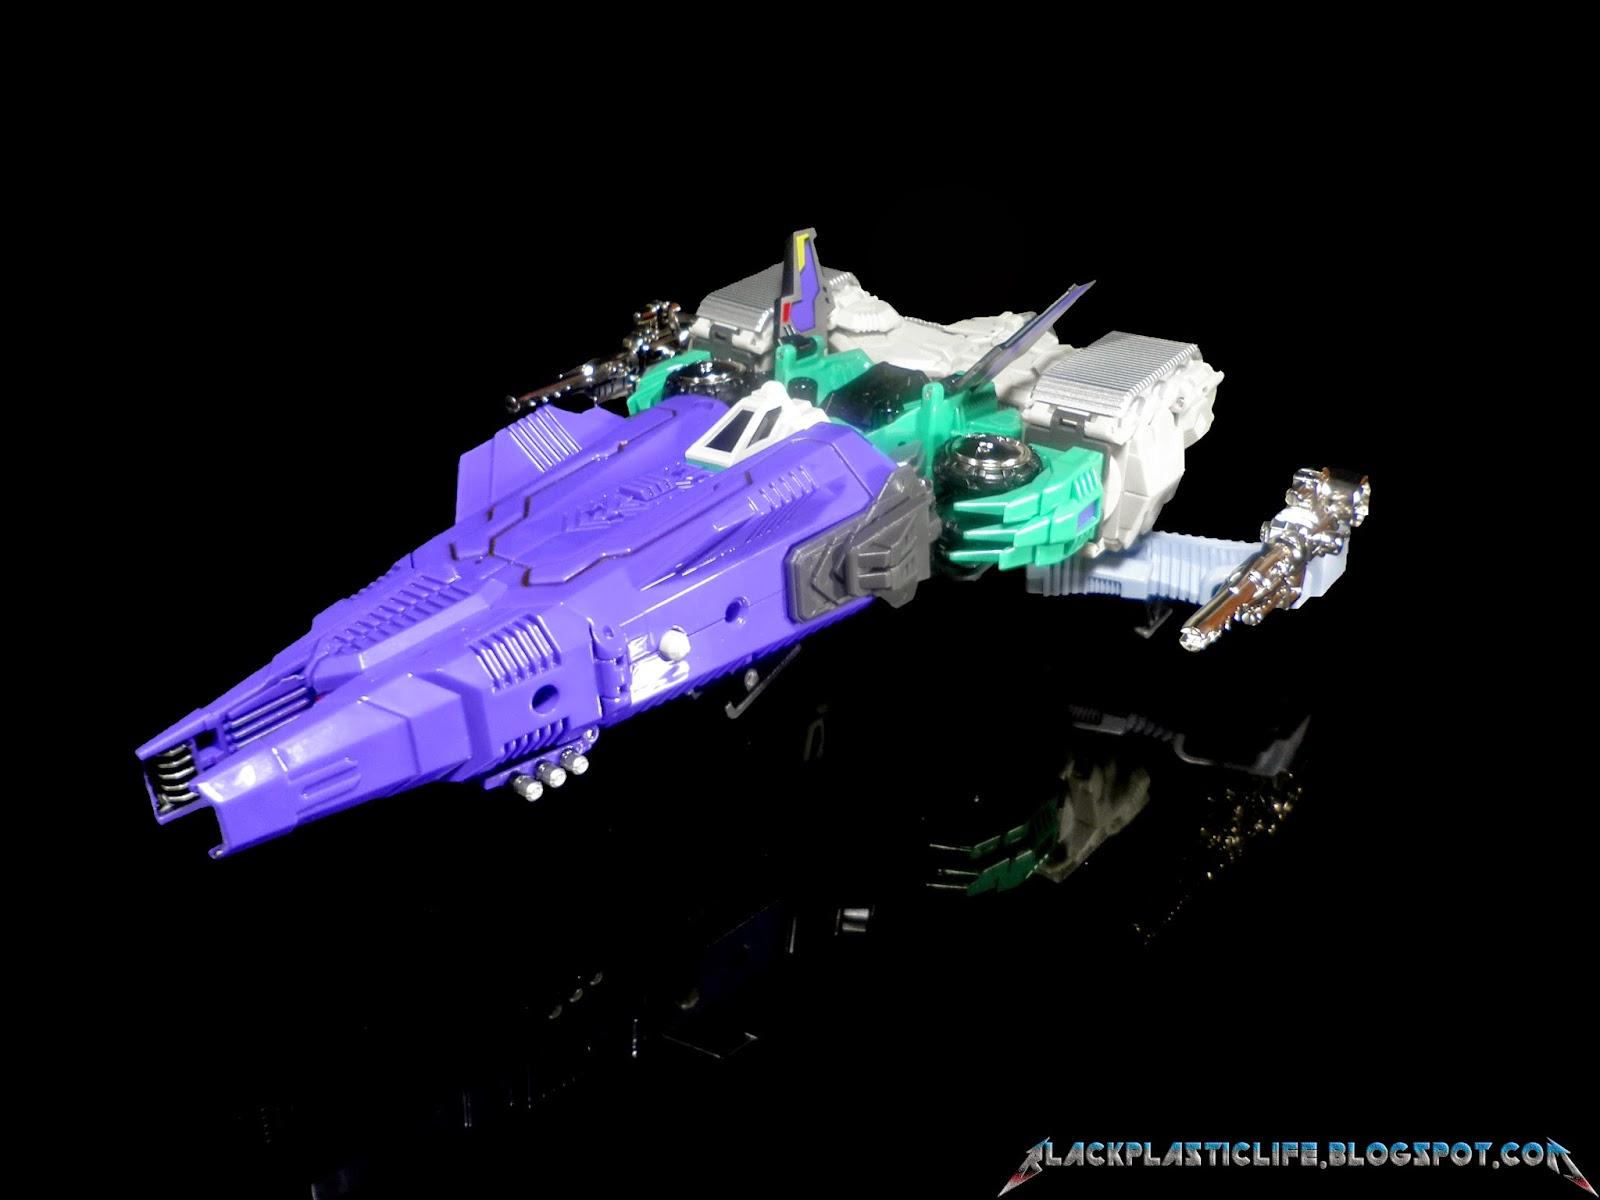 [Masterpiece Tiers] MMC R-01C CONTINUUM HEXATRON aka SIXSHOT - Sortie Nov. 2014 H6W8okOr